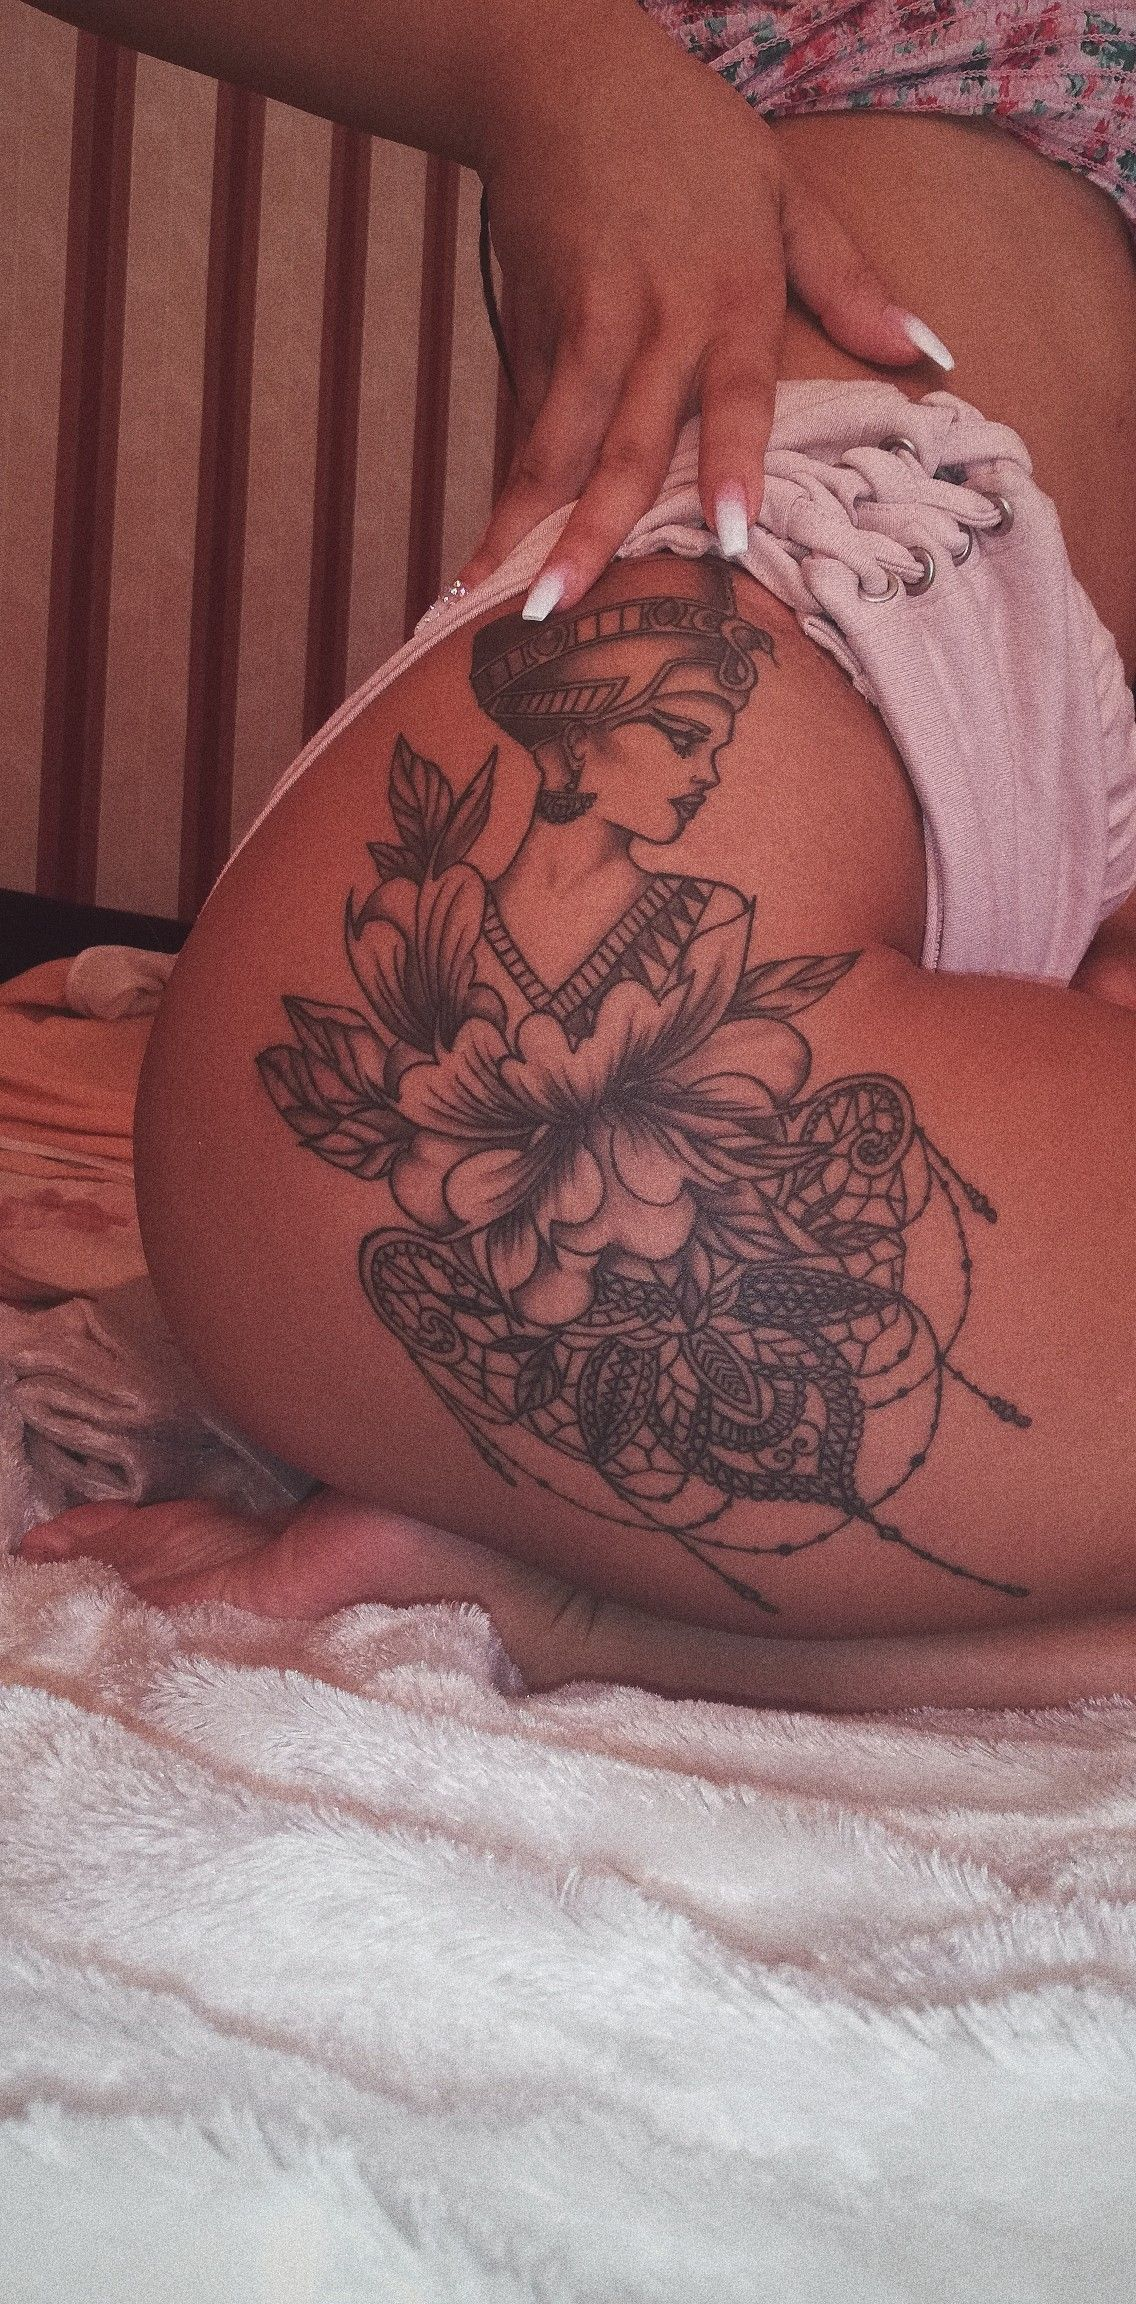 Nefertiti nails tattoo hip lotos mandala lotus flower nefertiti nails tattoo hip lotos mandala lotus flower izmirmasajfo